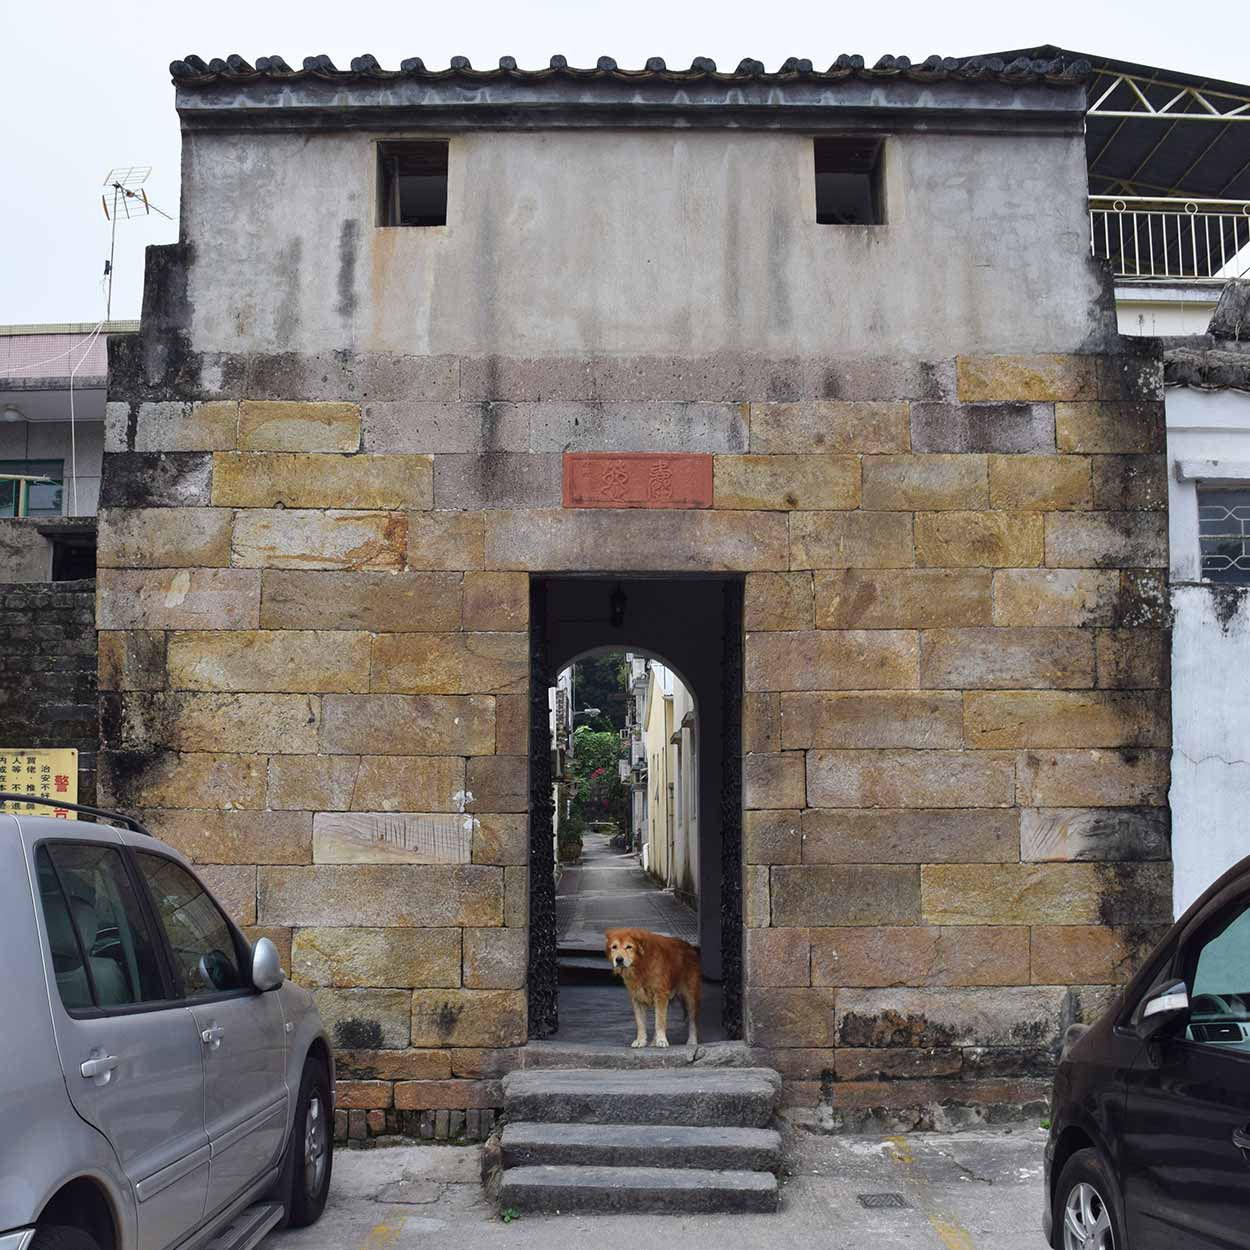 Ma Wat Wai walled village entrance, Lung Yeuk Tau Heritage Trail, Hong Kong, China